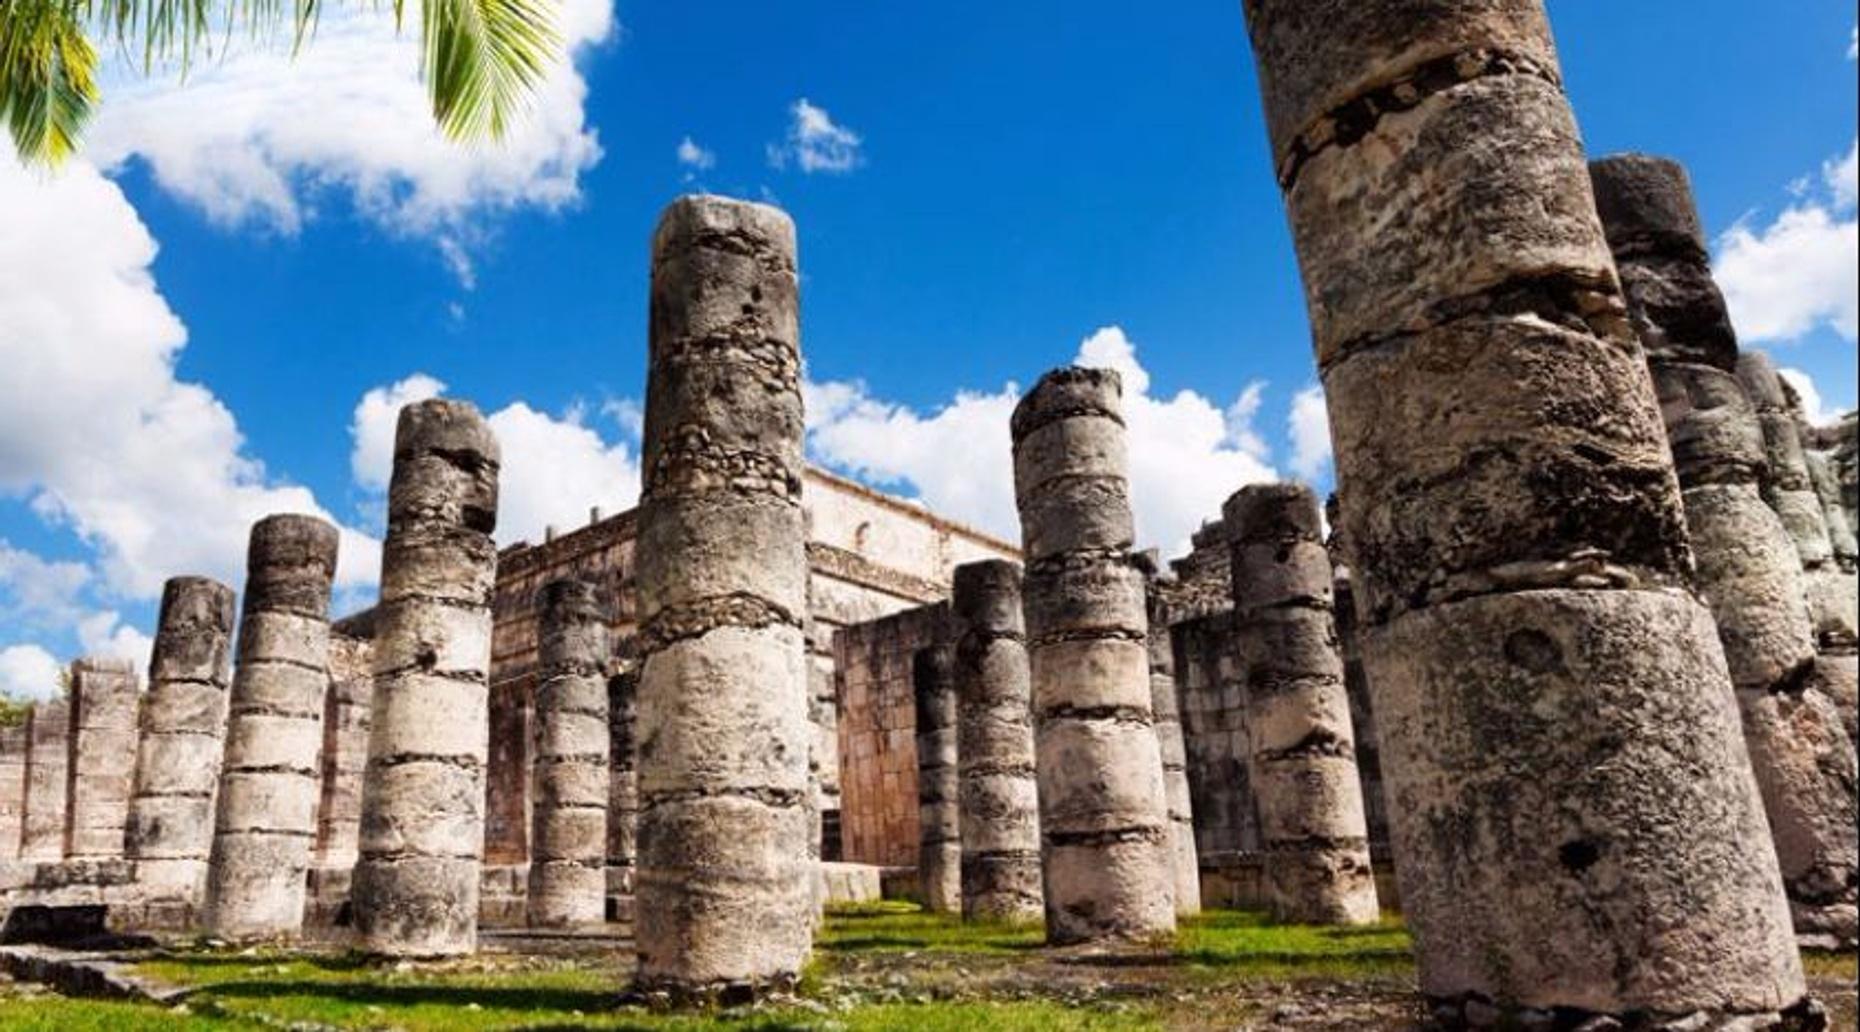 Chichen Itza Classic Tour from Cancun